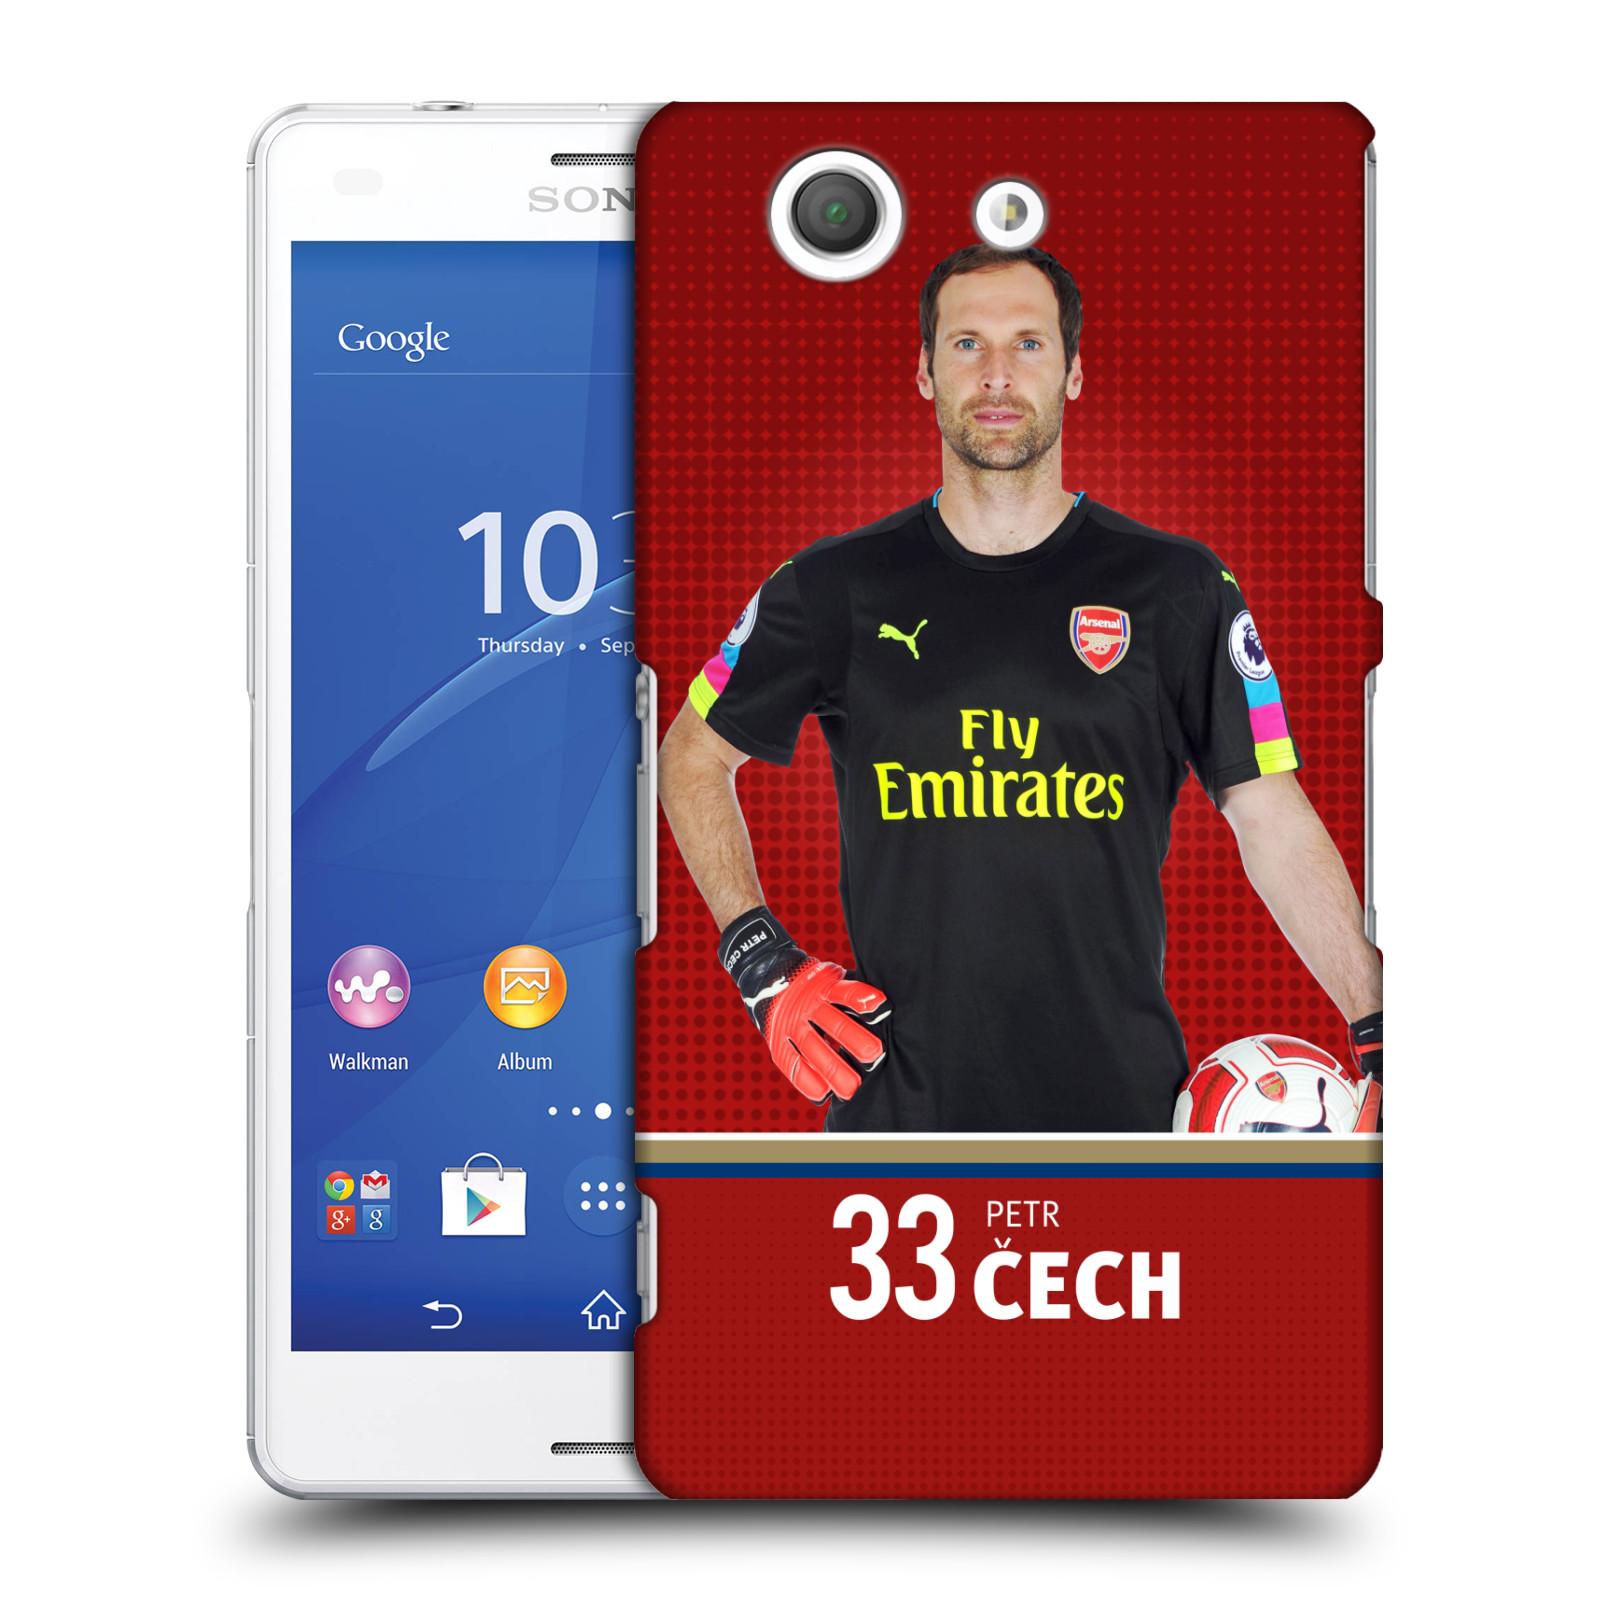 Plastové pouzdro na mobil Sony Xperia Z3 Compact D5803 - Head Case - Arsenal FC - Petr Čech